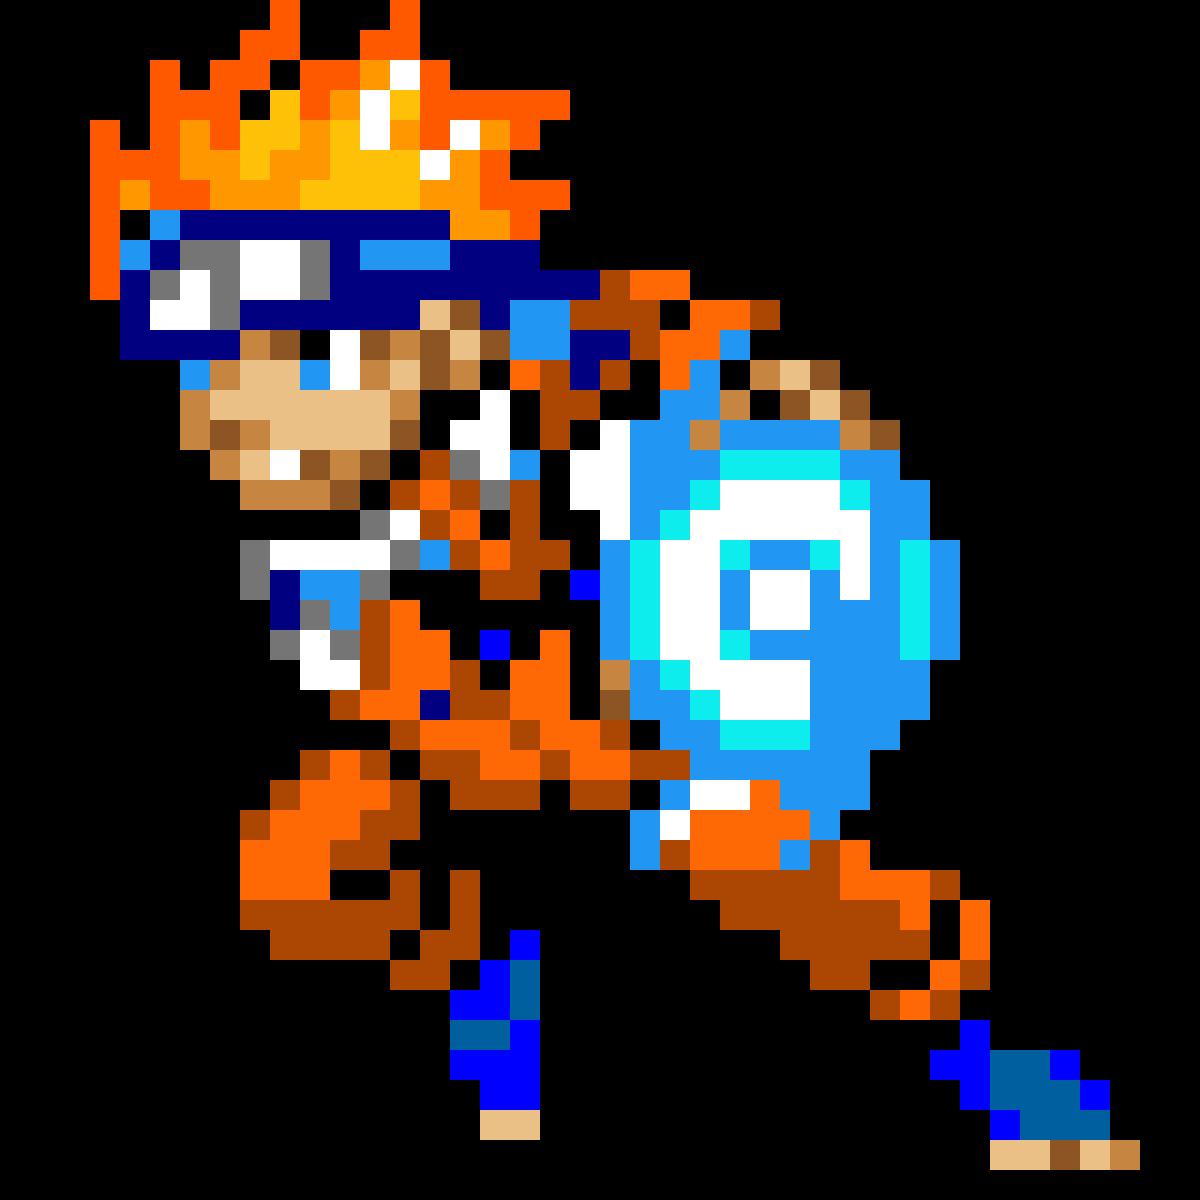 Minecraft Naruto Art Pixel Area Download Free Image Anime Pixel Art Pixel Art Grid Pixel Art Pattern